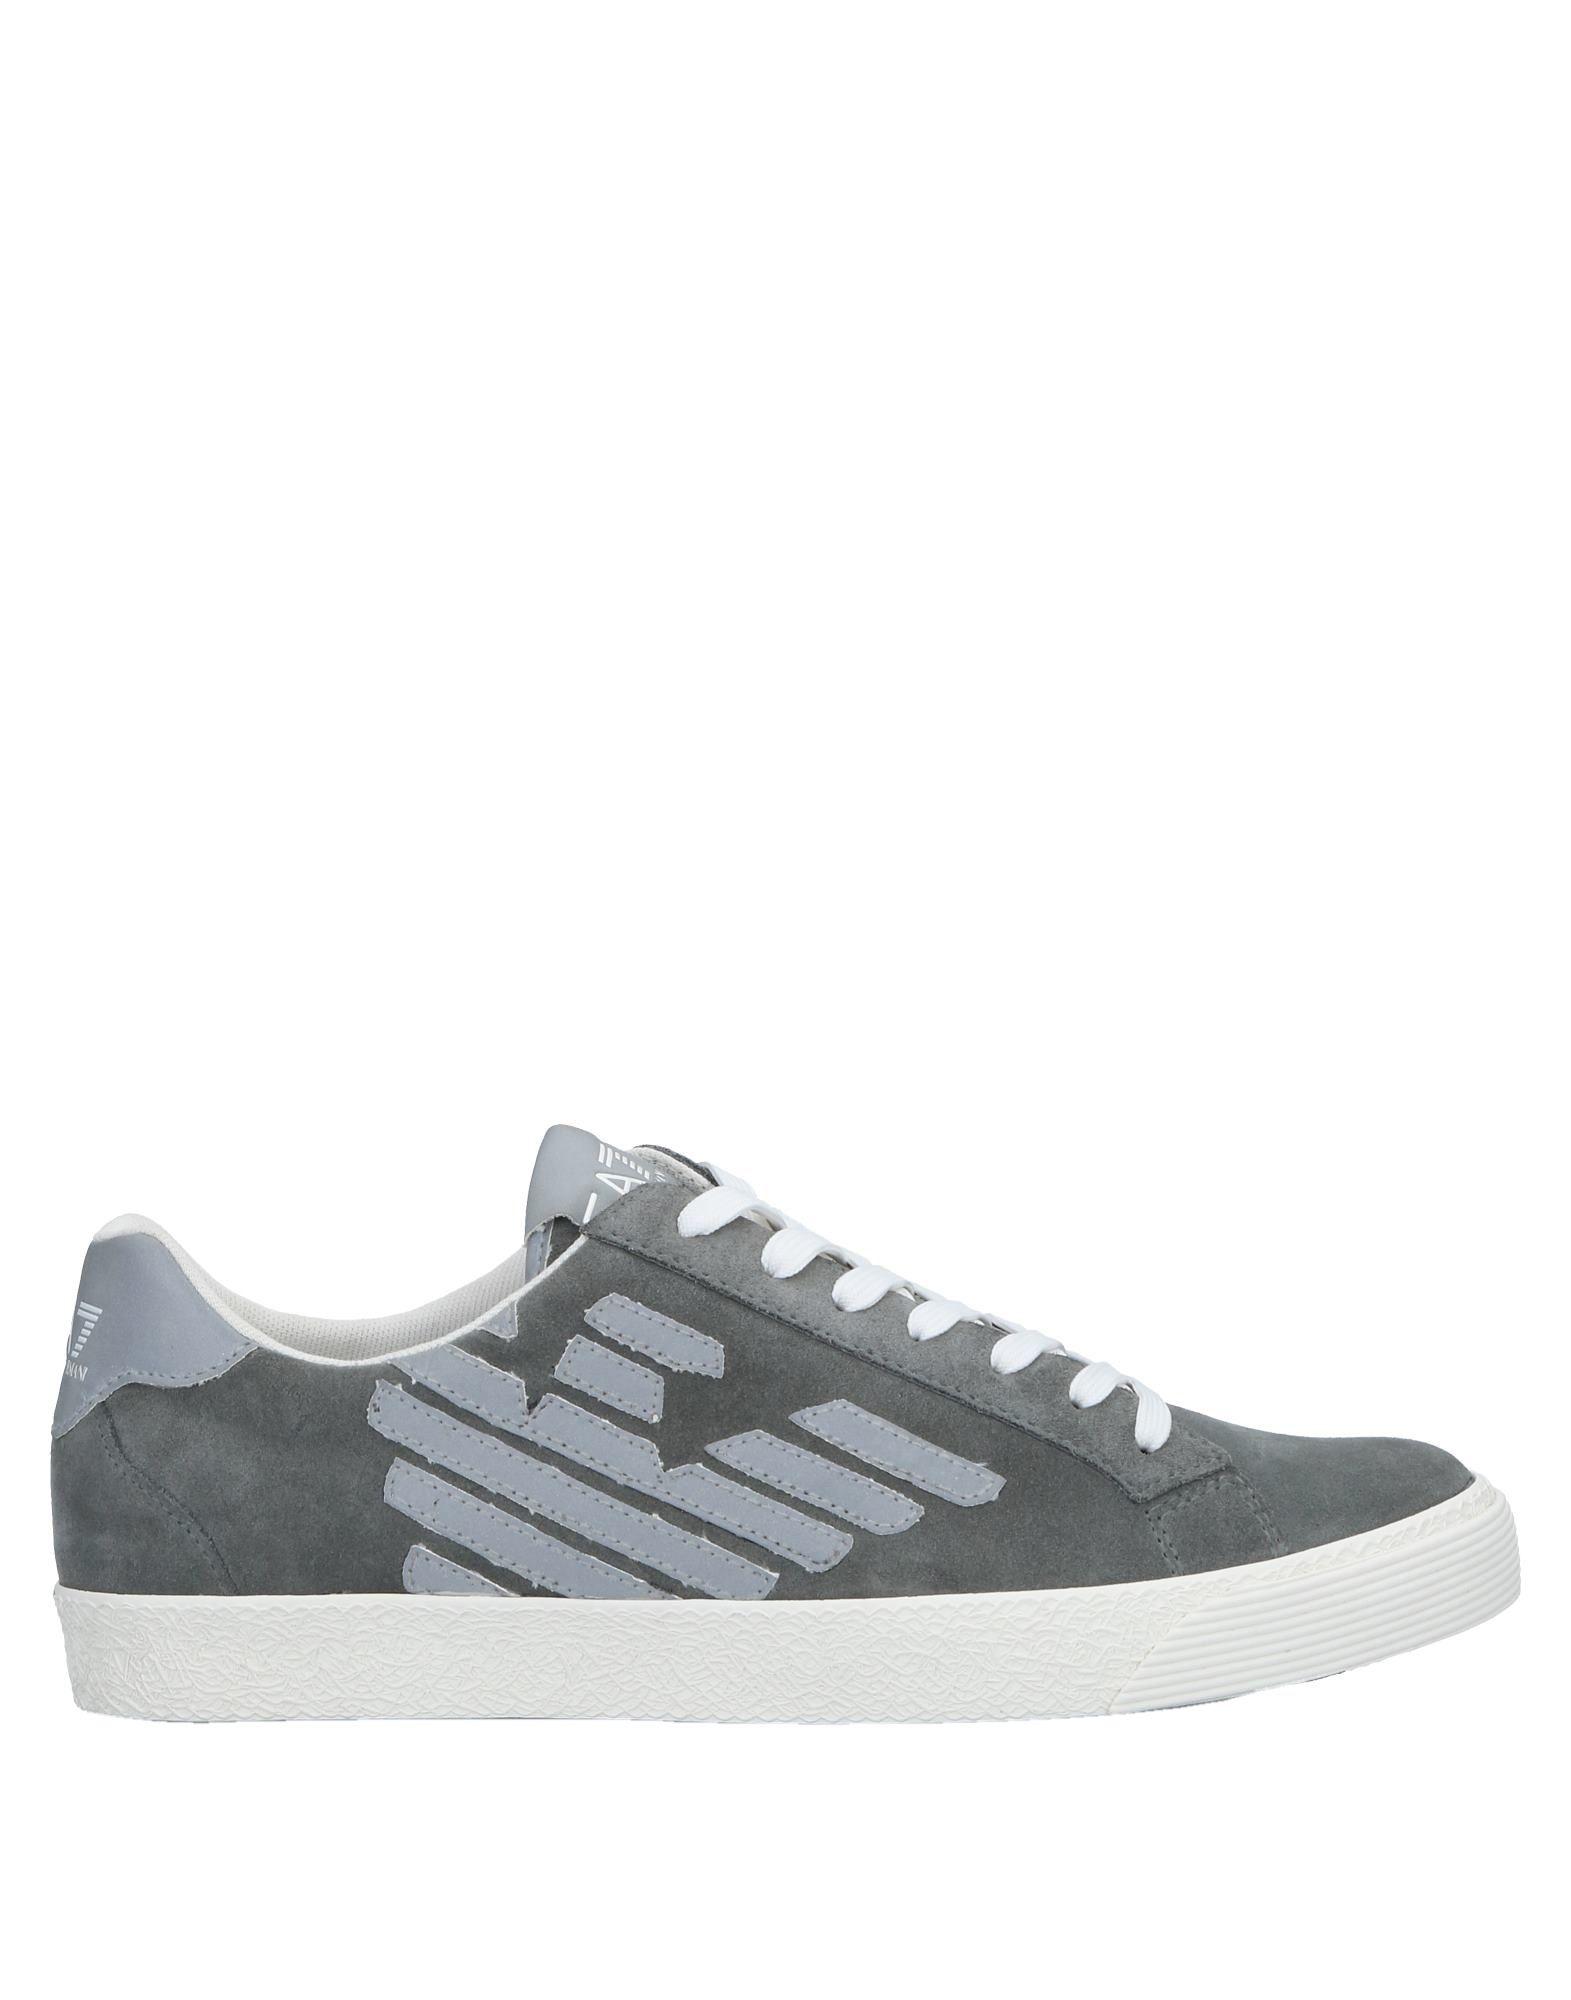 Emporio Armani Sneakers Herren  11499014JE